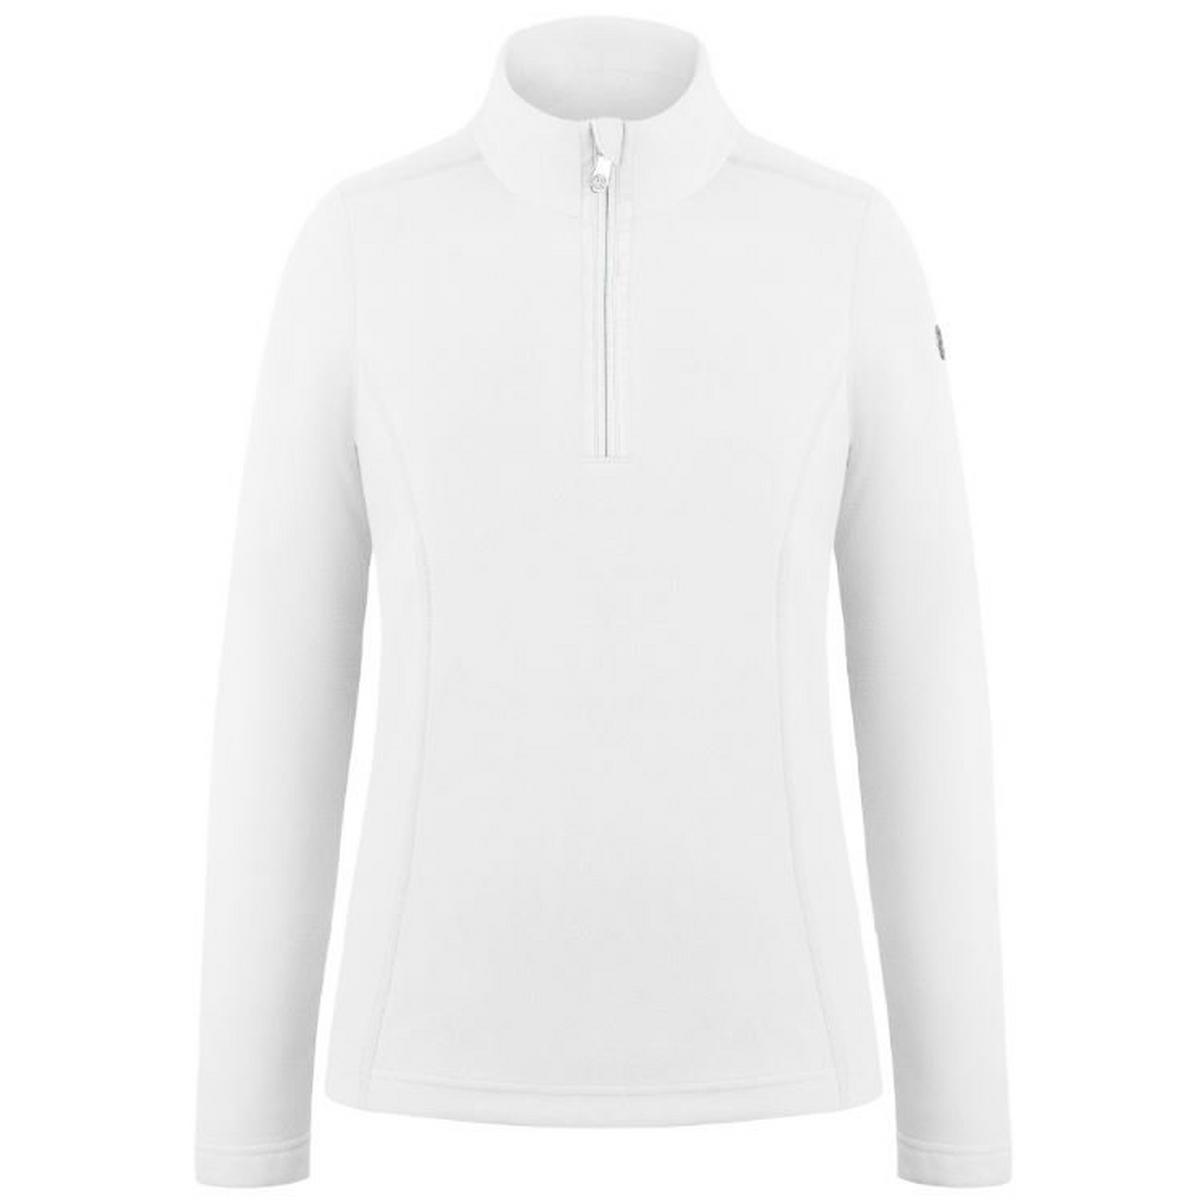 Poivre Blanc Kid's Fleece Sweater